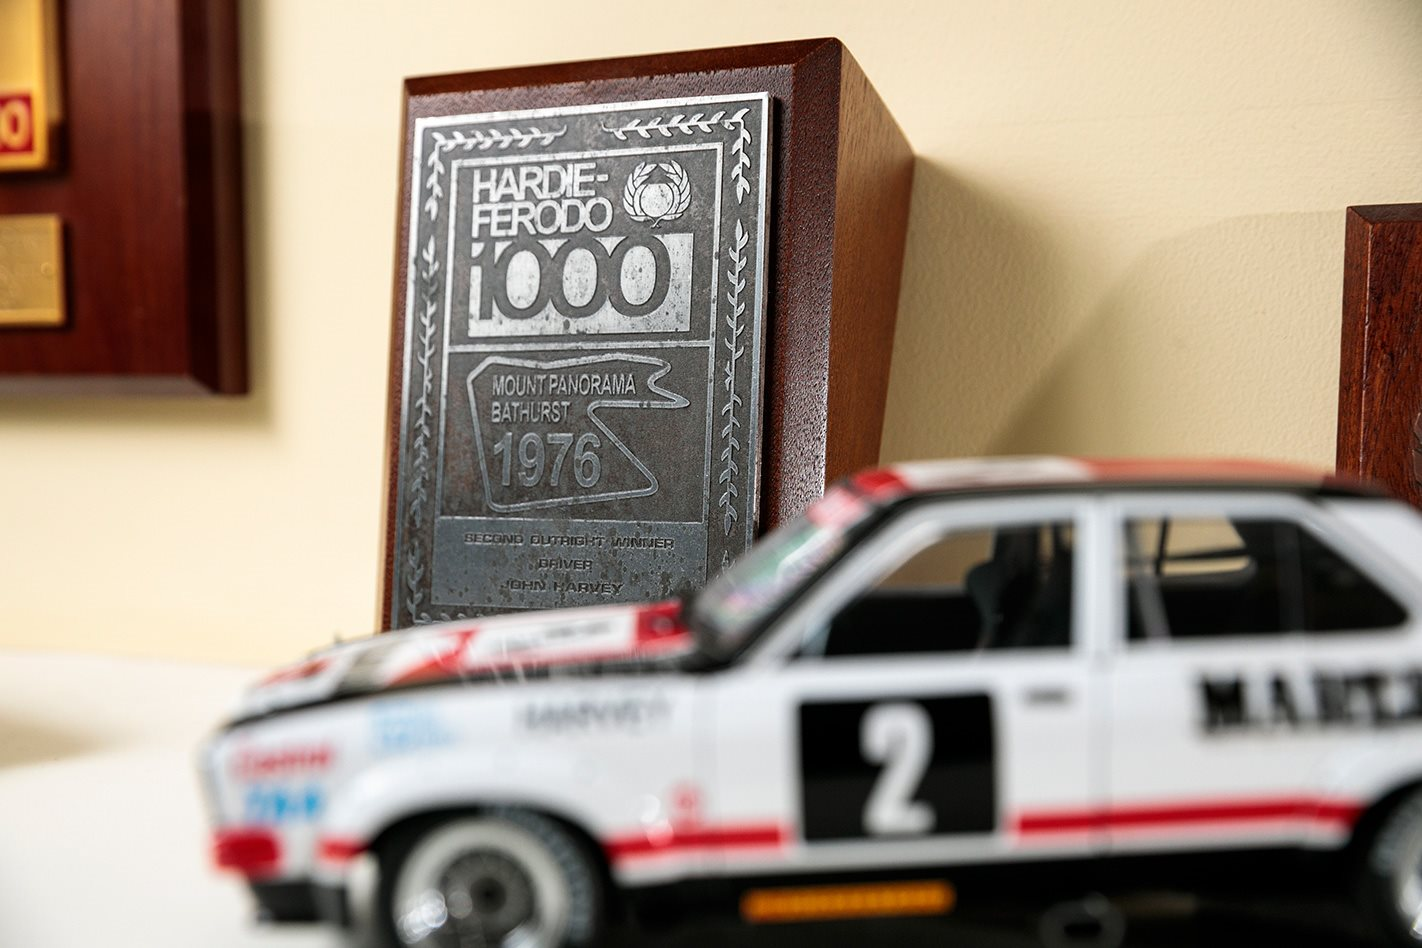 Bathurst 100 trophy 1976.jpg